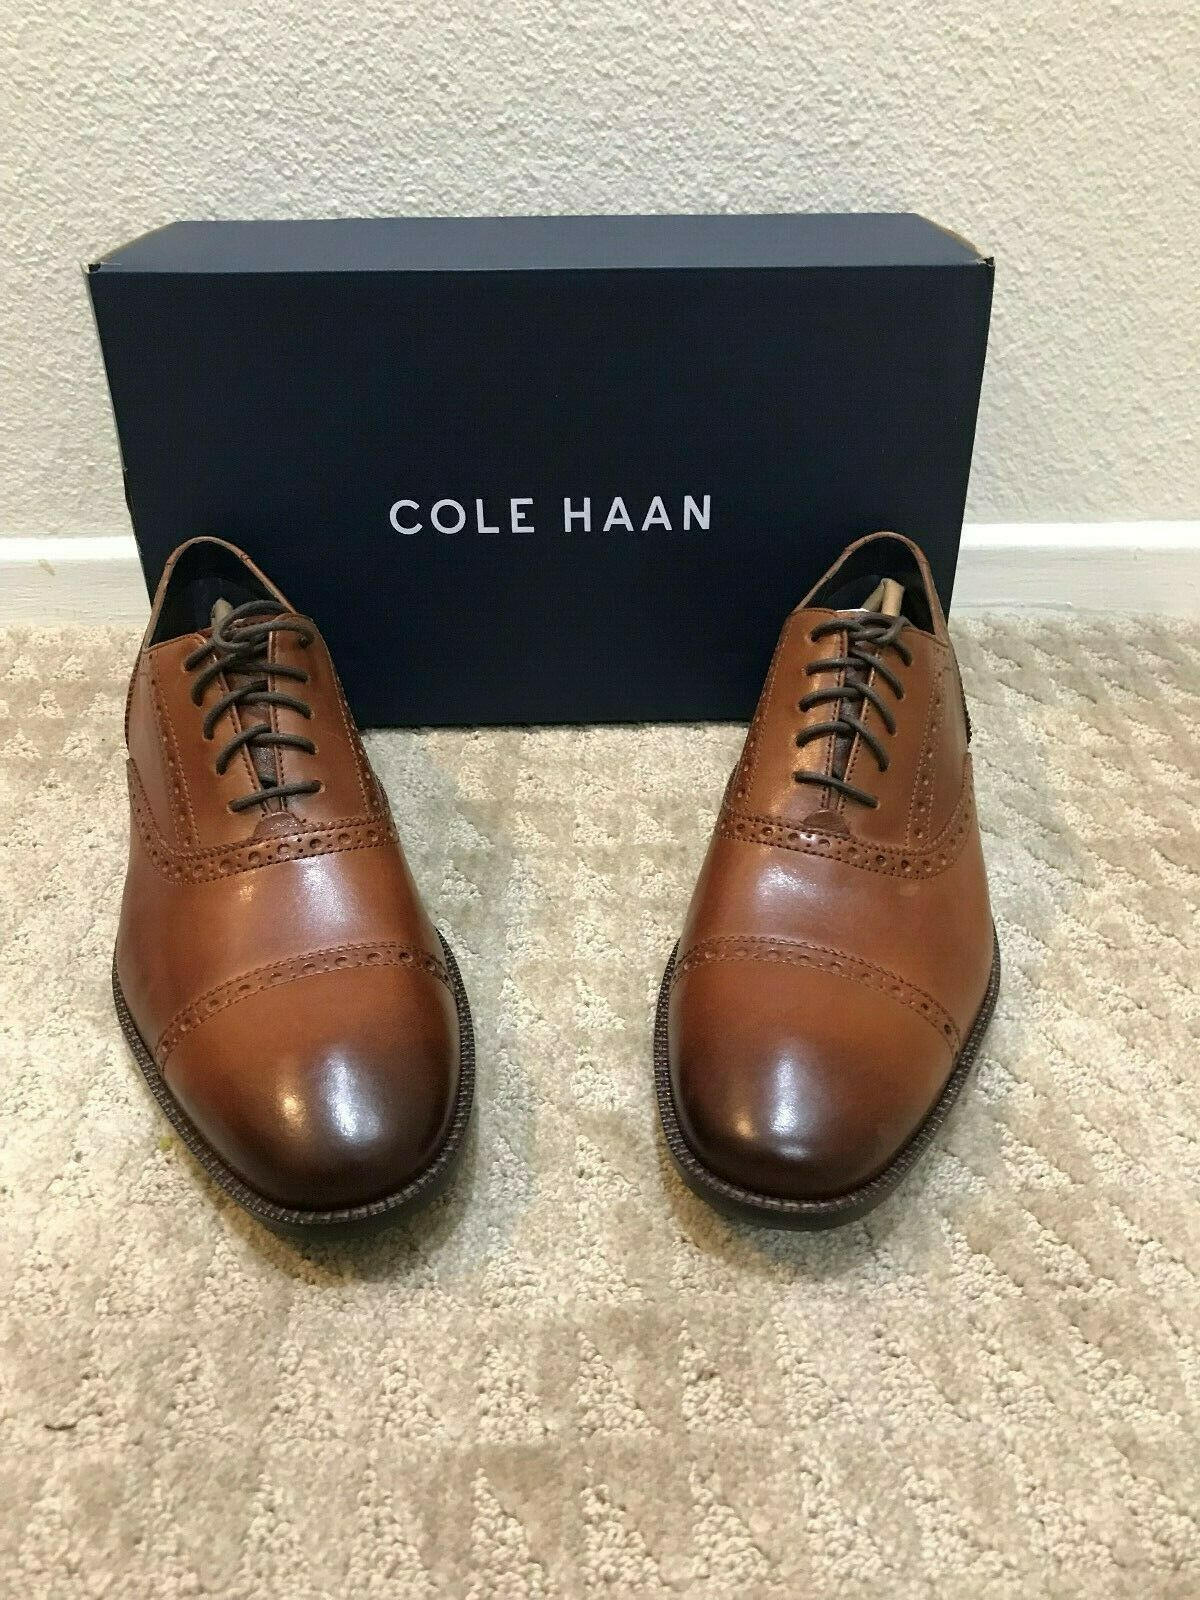 Cole Haan Wayne Cap Toe, British Tan Decorative Perforation Size 11.5M C30689